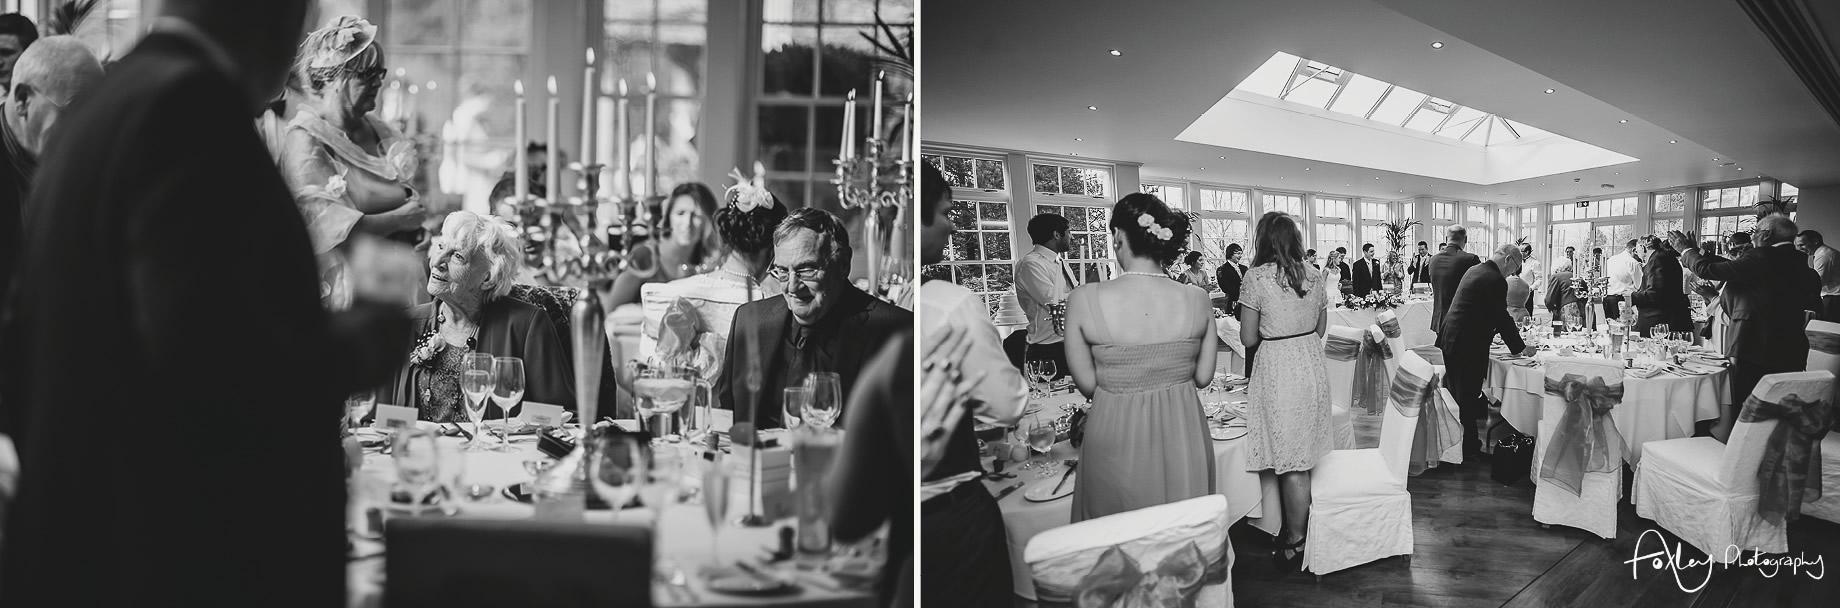 Gemma and Lewis' Wedding at Mitton Hall 126